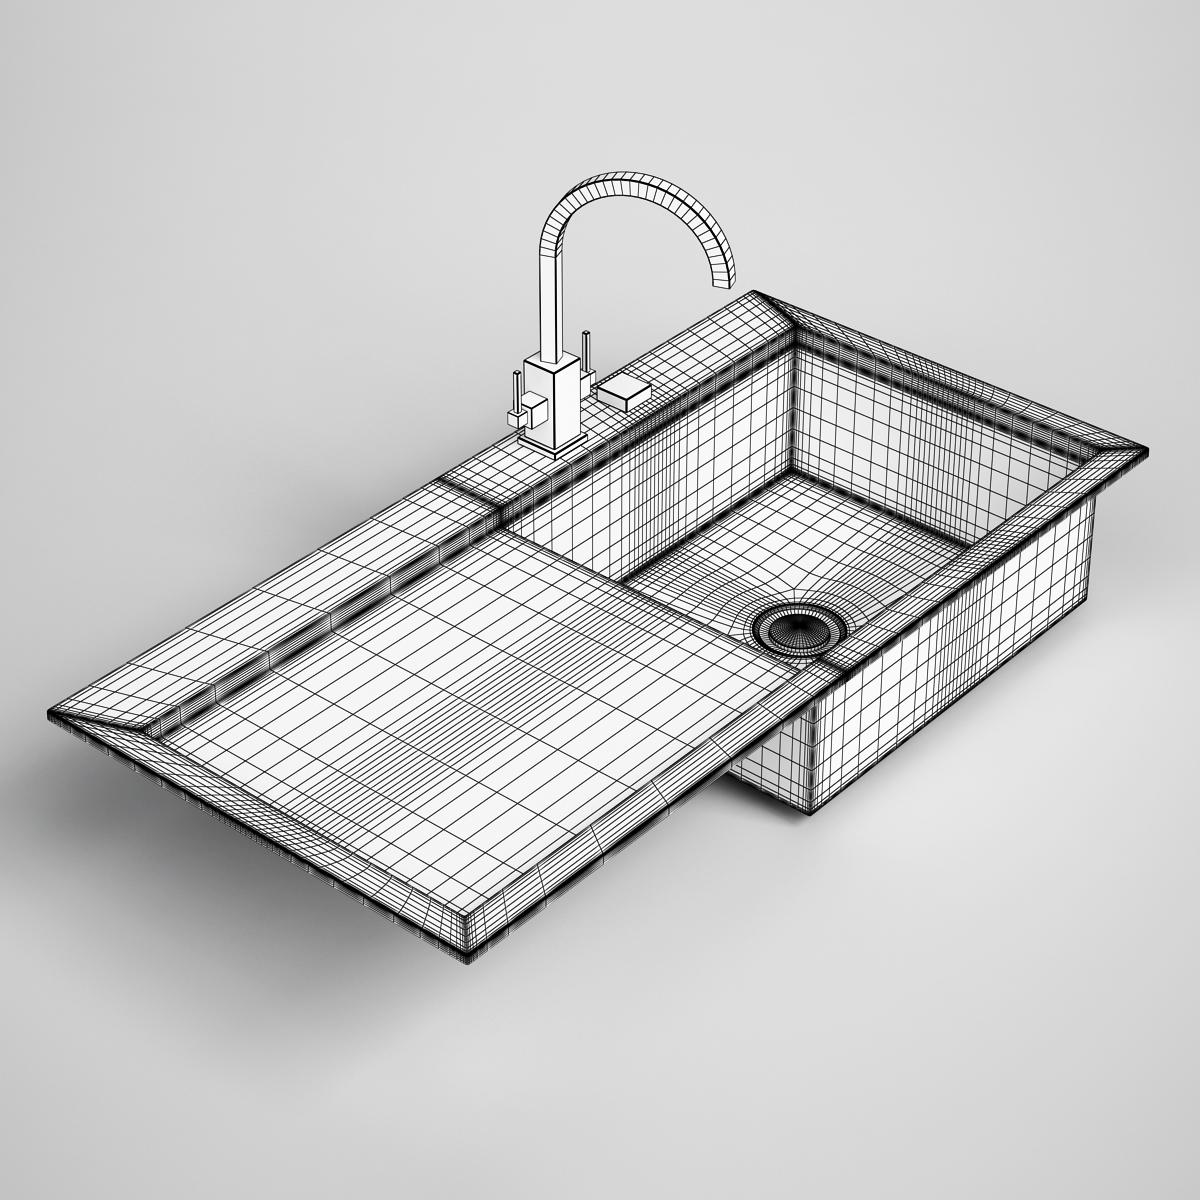 ... Kitchen Sink 24 3d Model Max Obj Fbx C4d 2